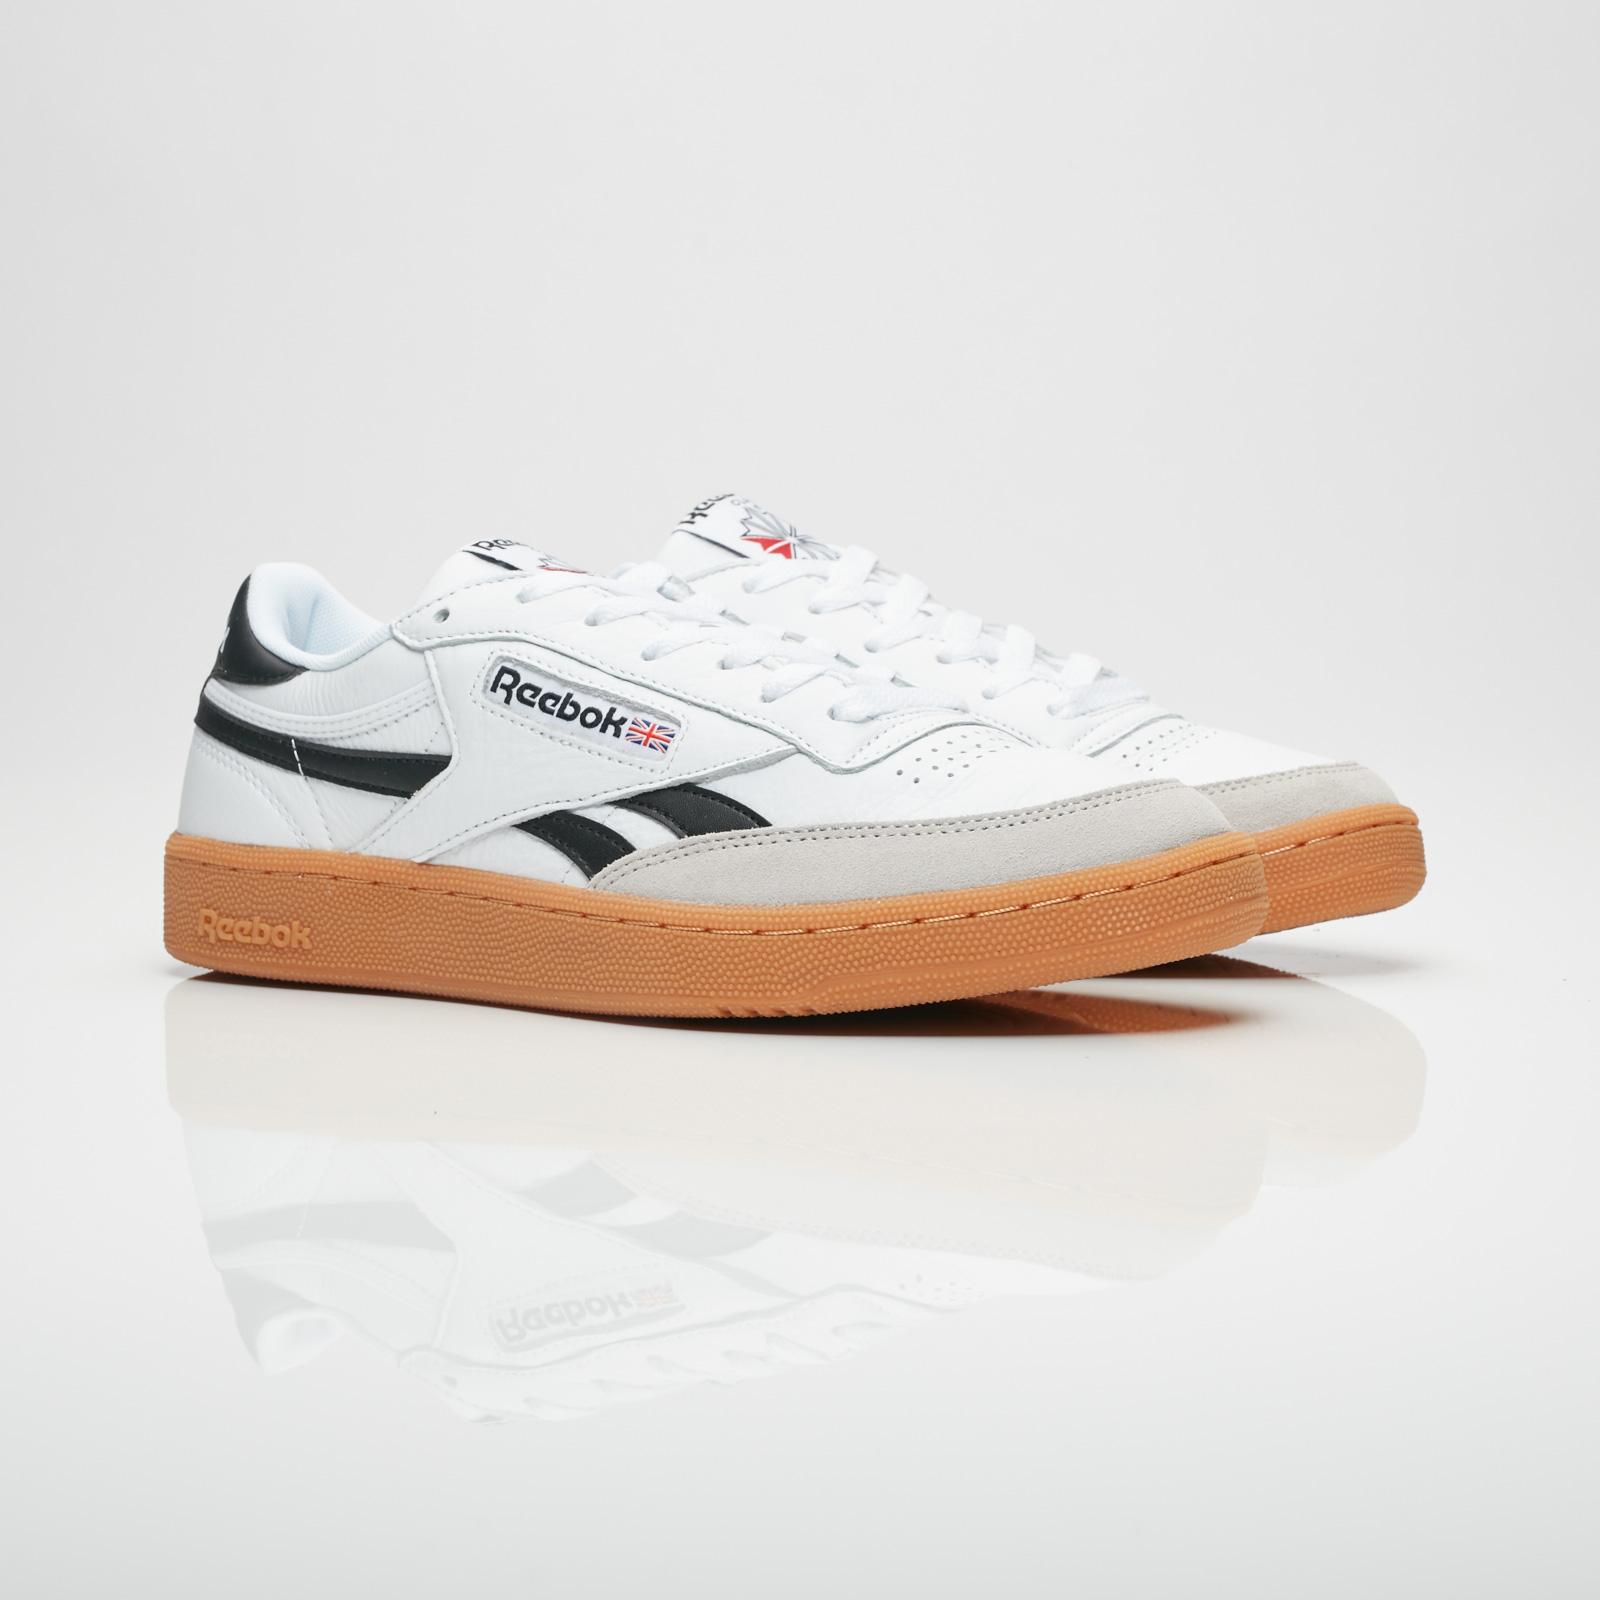 5e192d5fcfe69 Reebok Revenge Plus Gum - Cm8791 - Sneakersnstuff